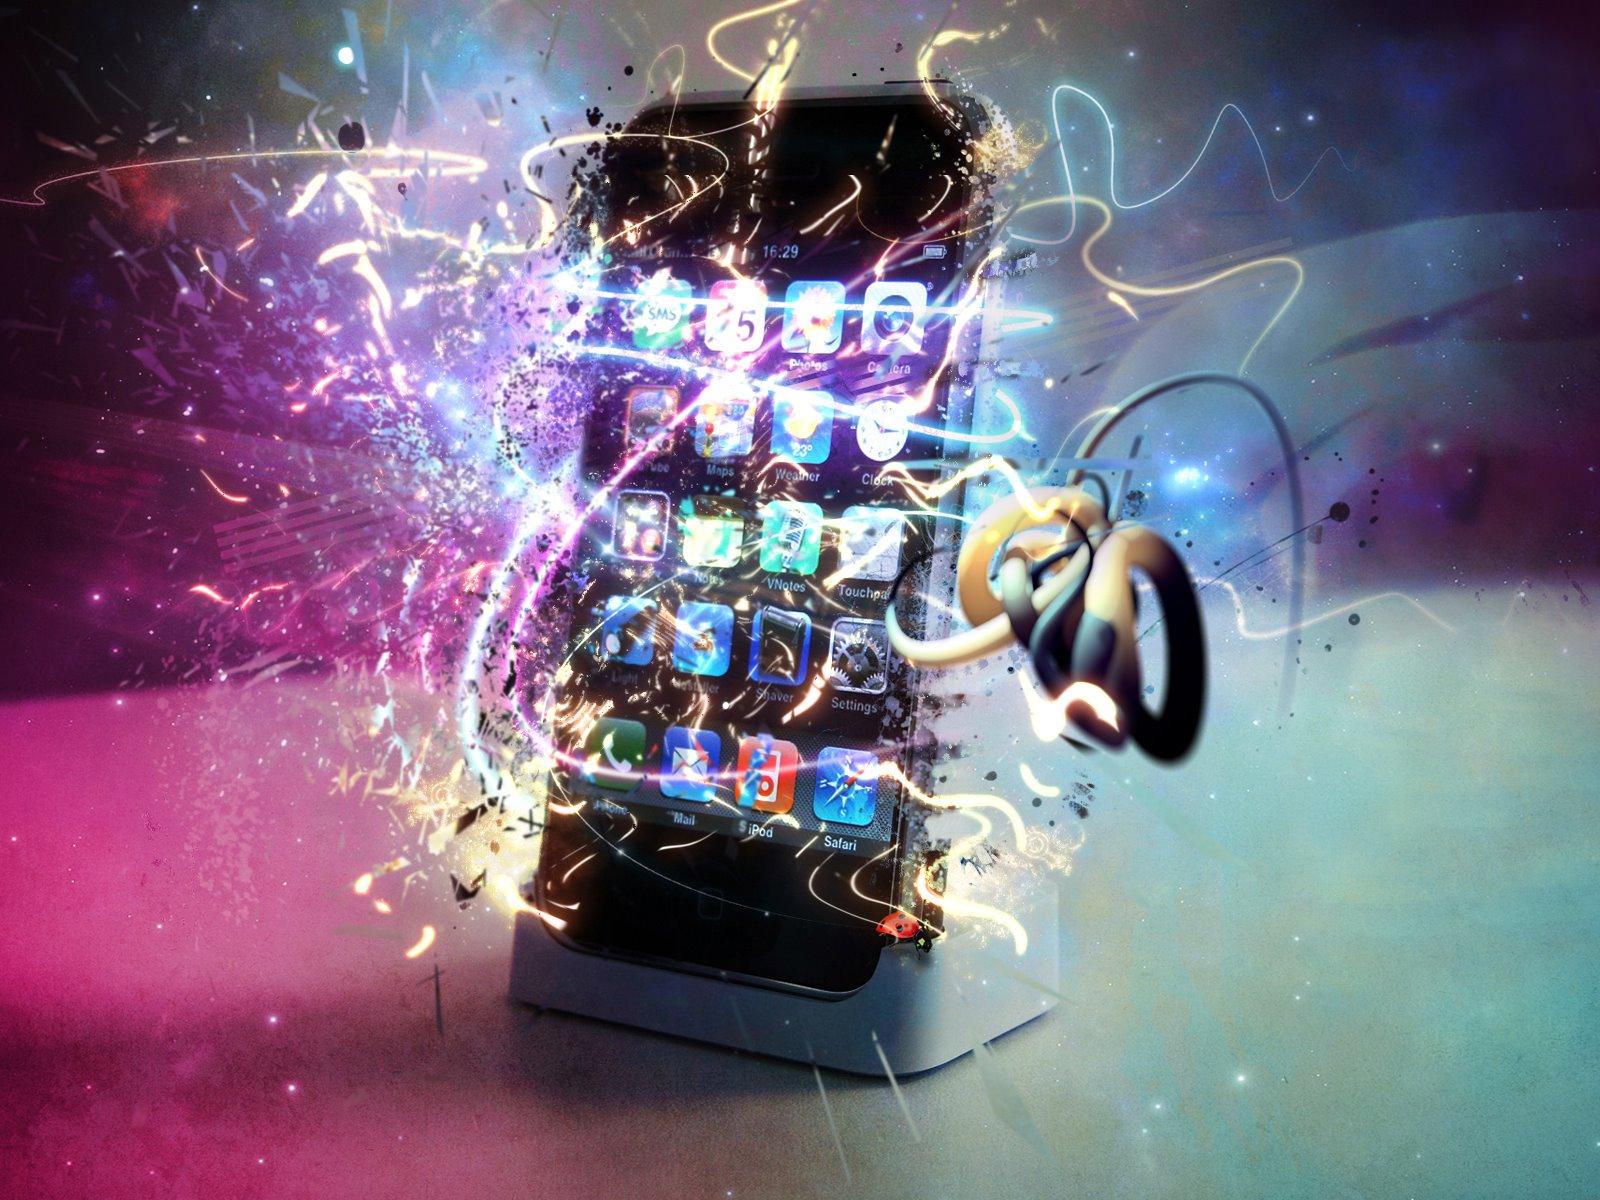 Wallpaper iphone magic iphone magic rainbow iphone magic voltagebd Image collections